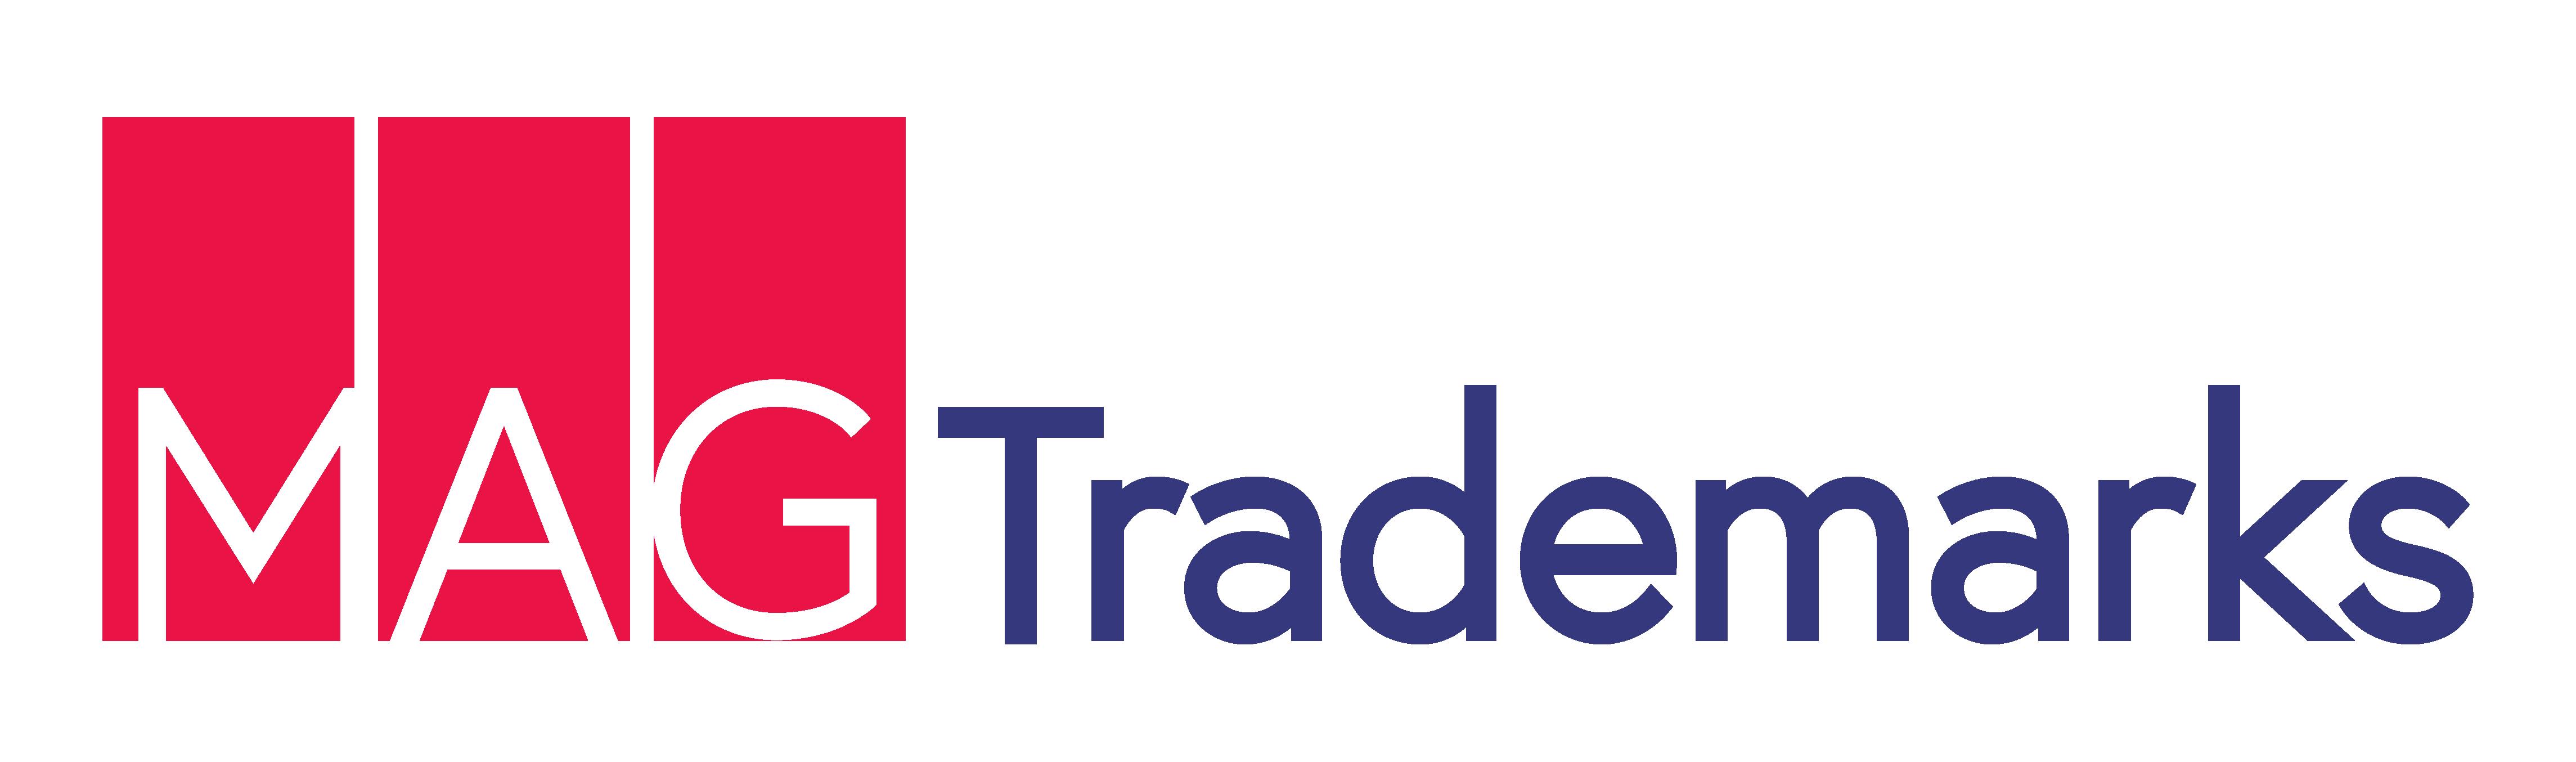 MAG Trademarks Logo